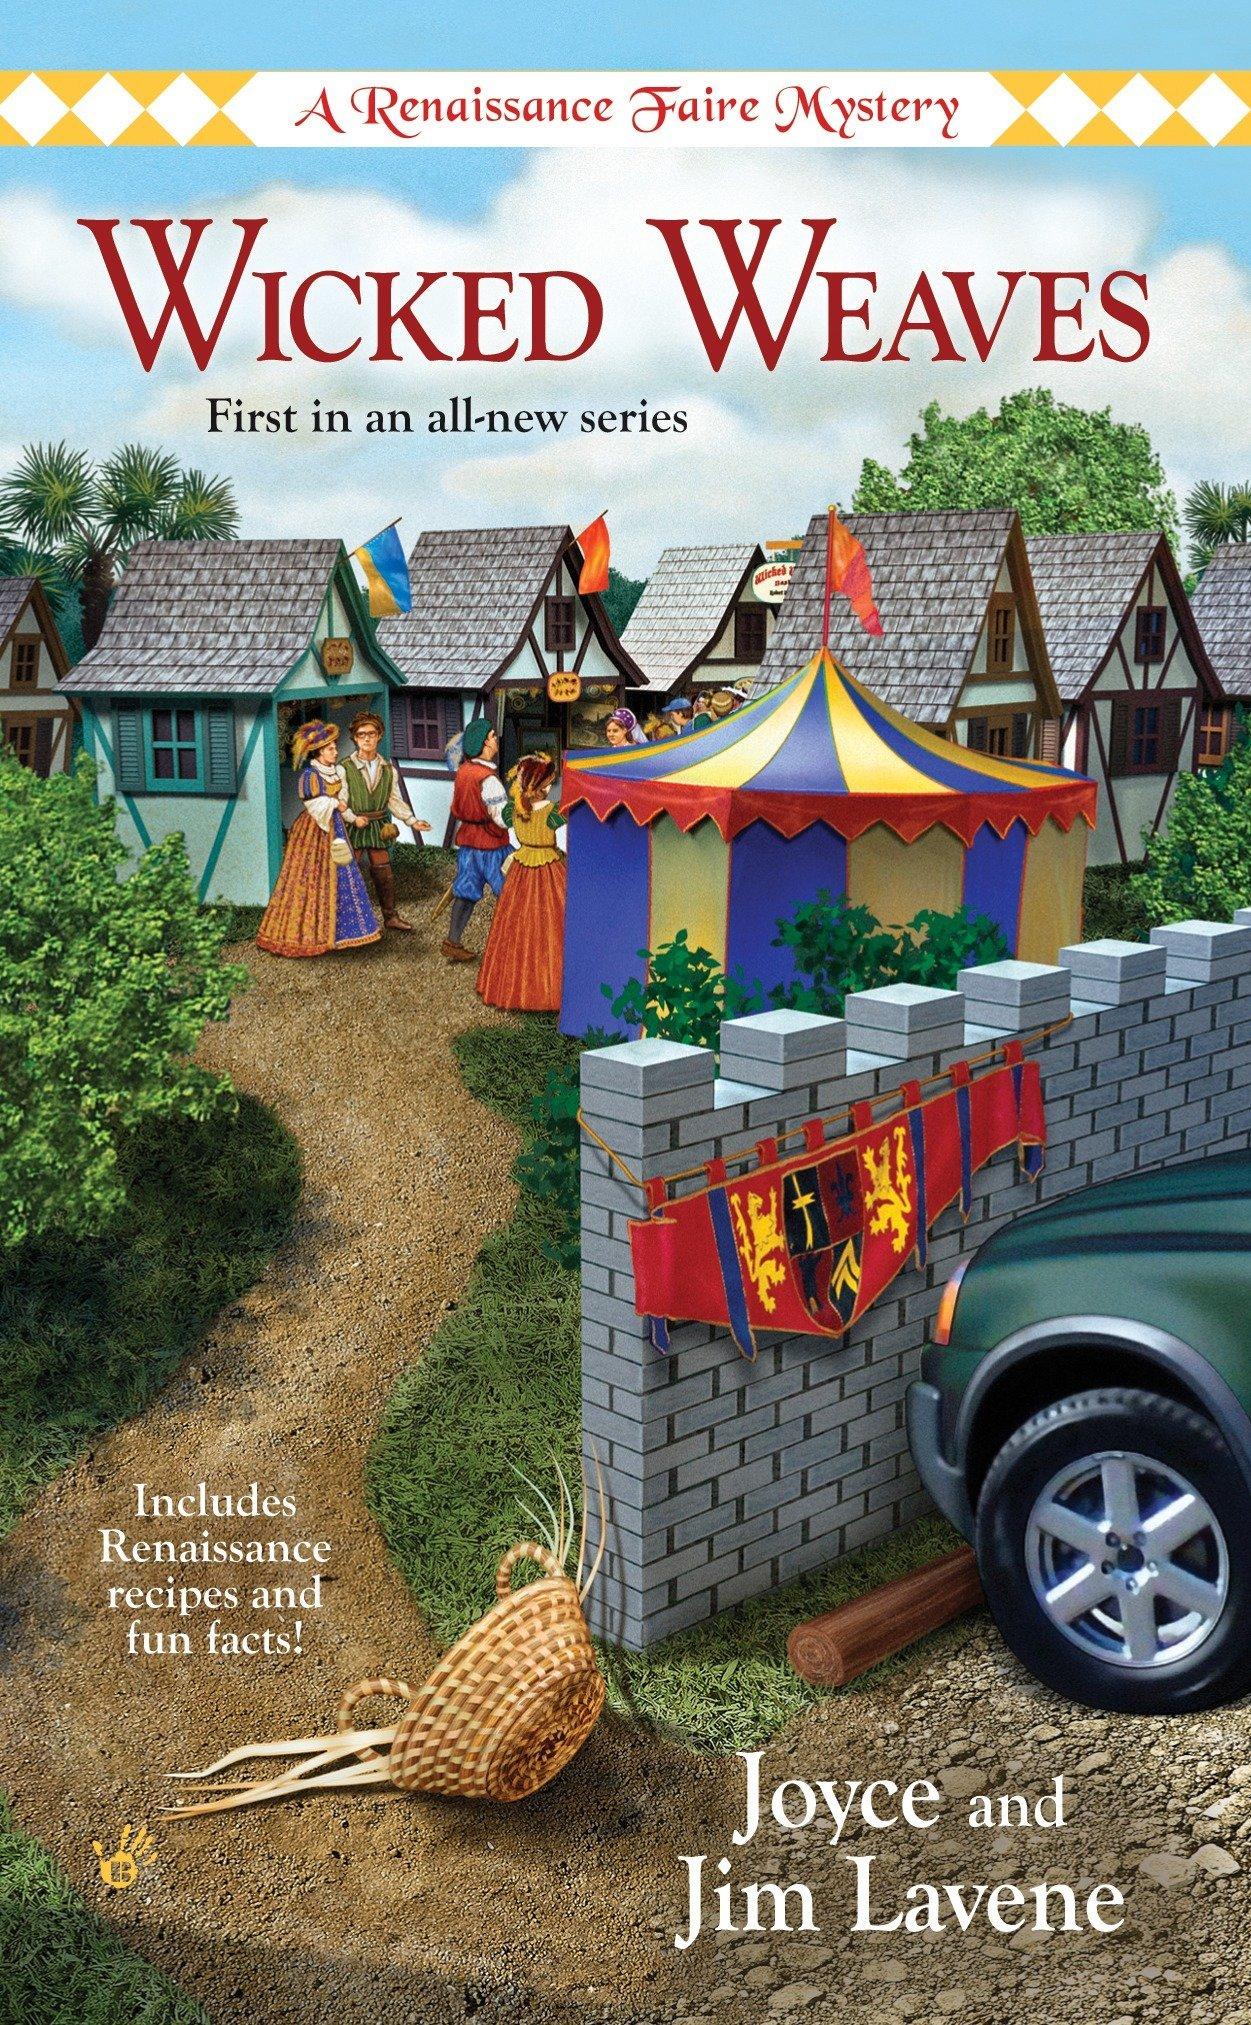 Read Online Wicked Weaves (Renaissance Faire Mysteries, No. 1) ebook